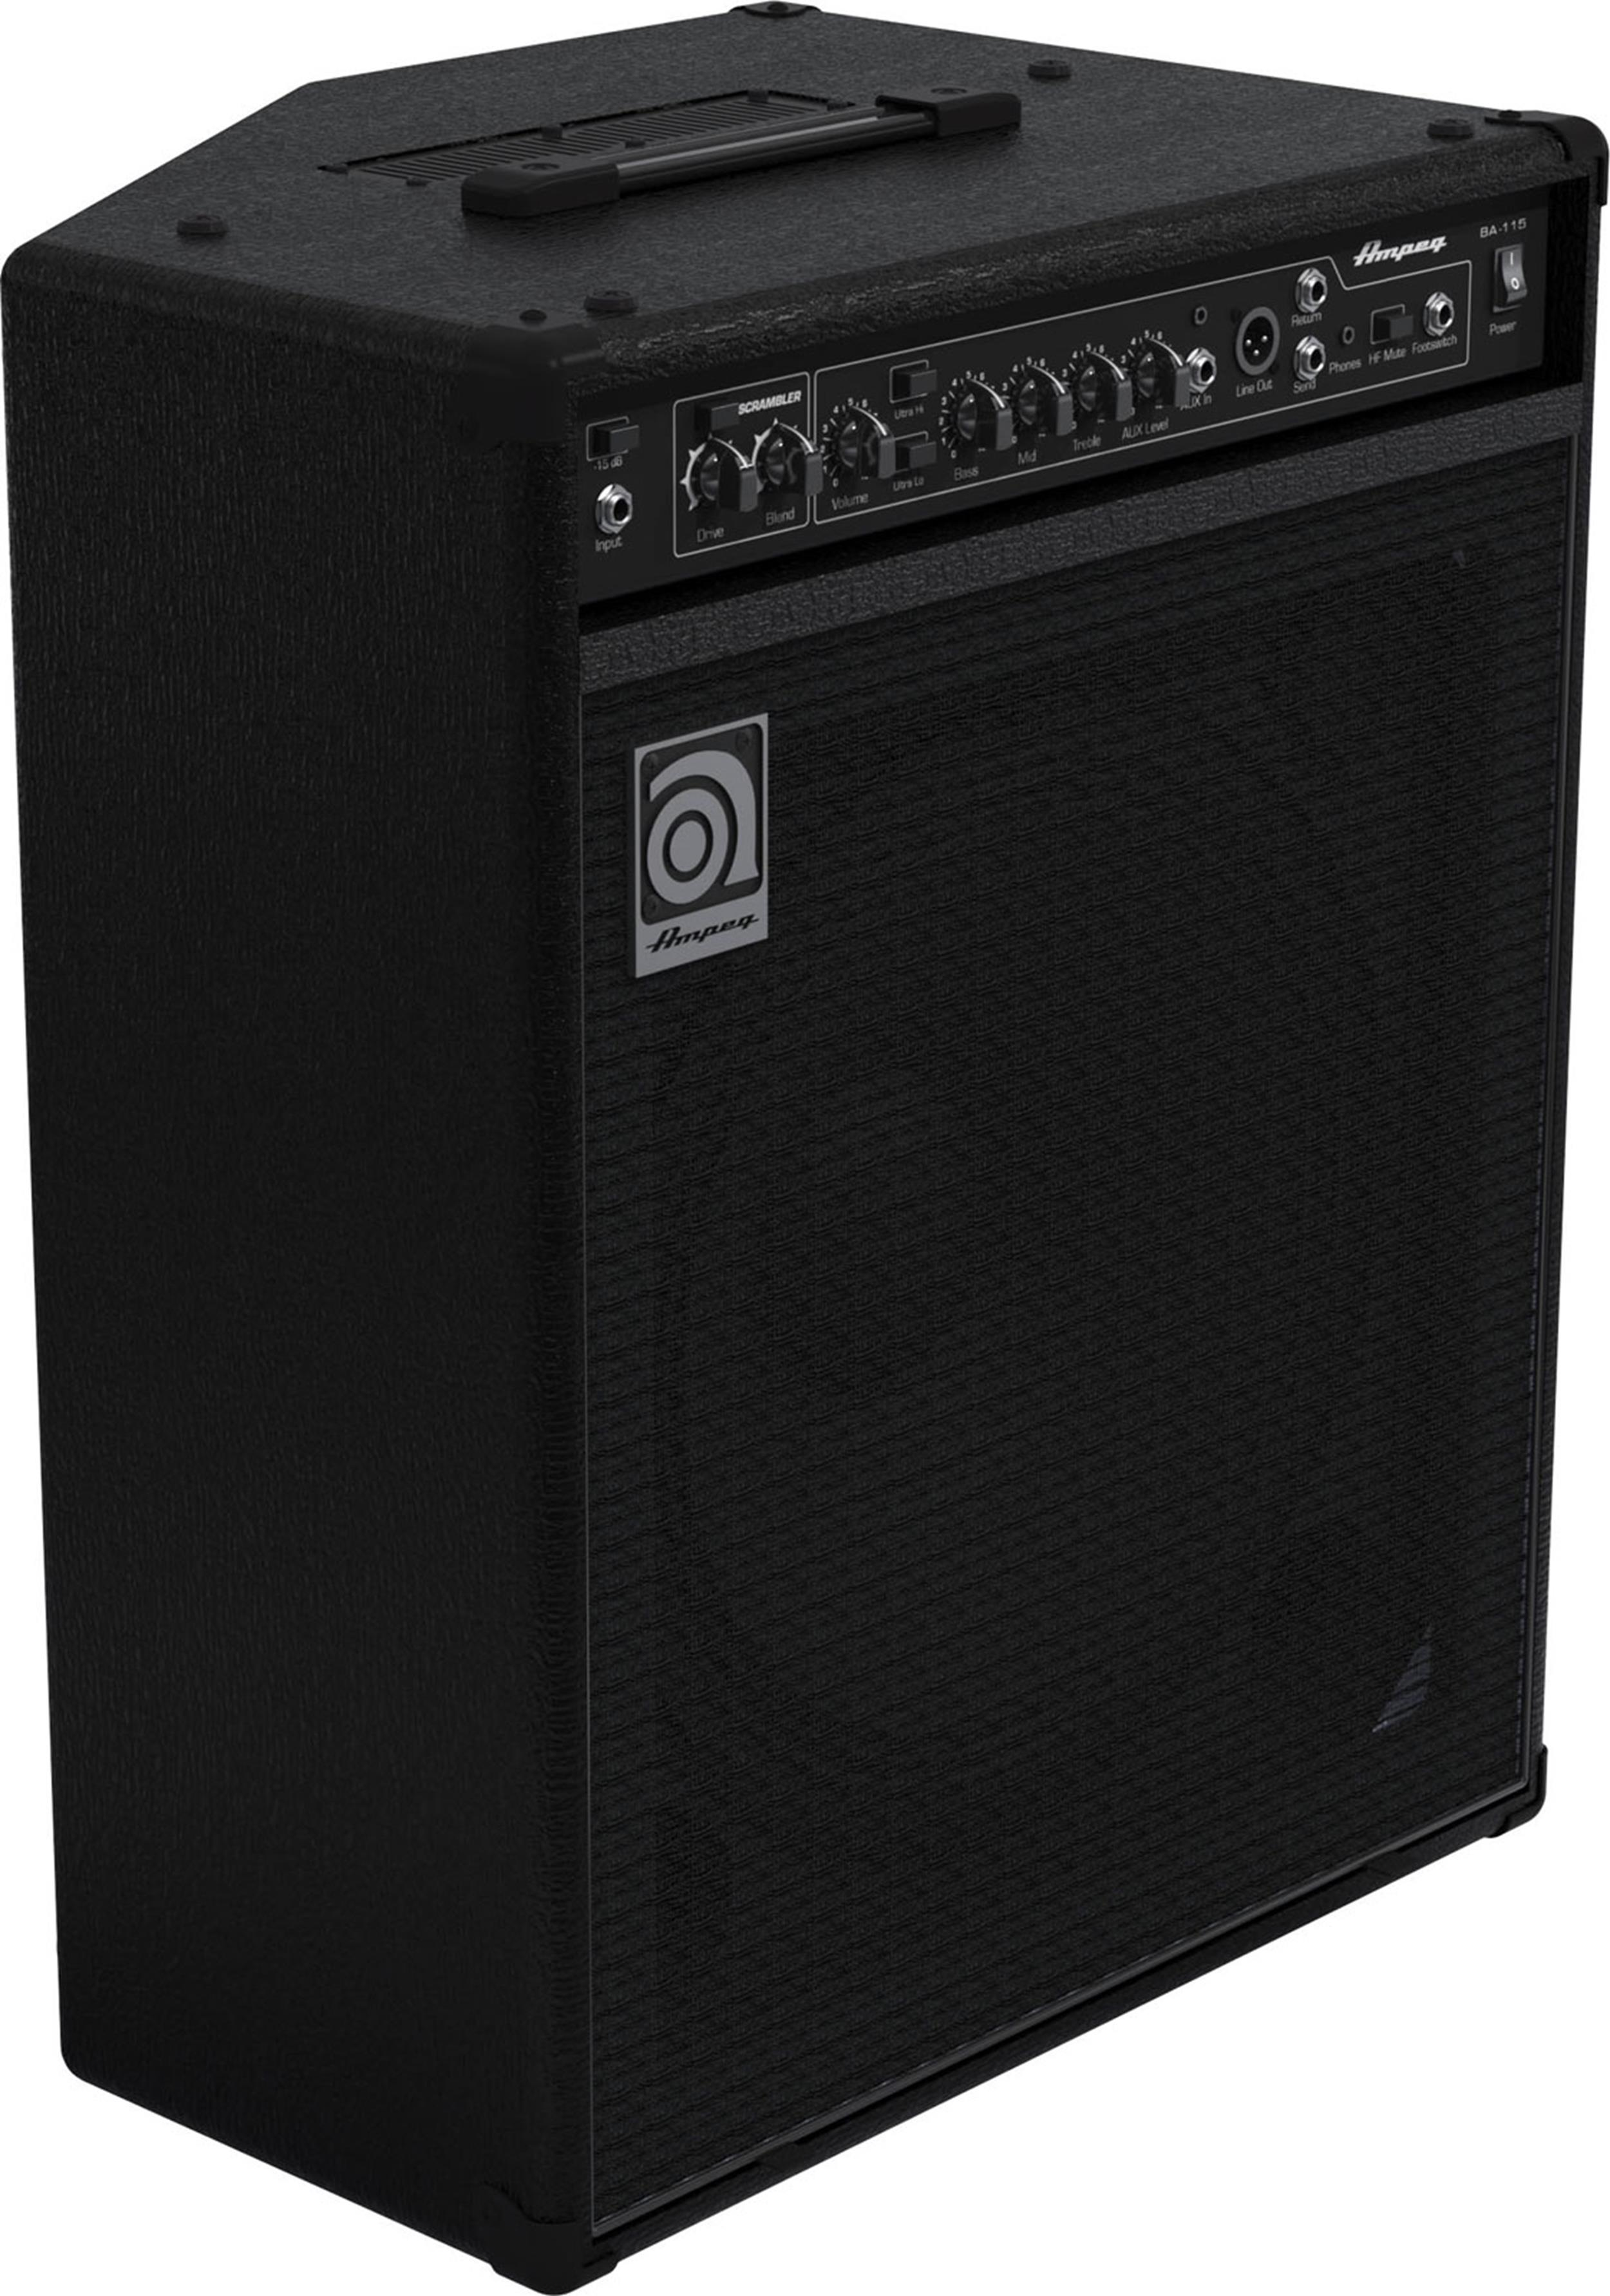 AMPEG BA 115 v2 AMPLIFICATORE - 2012703 - Bassi Amplificatori - Combo